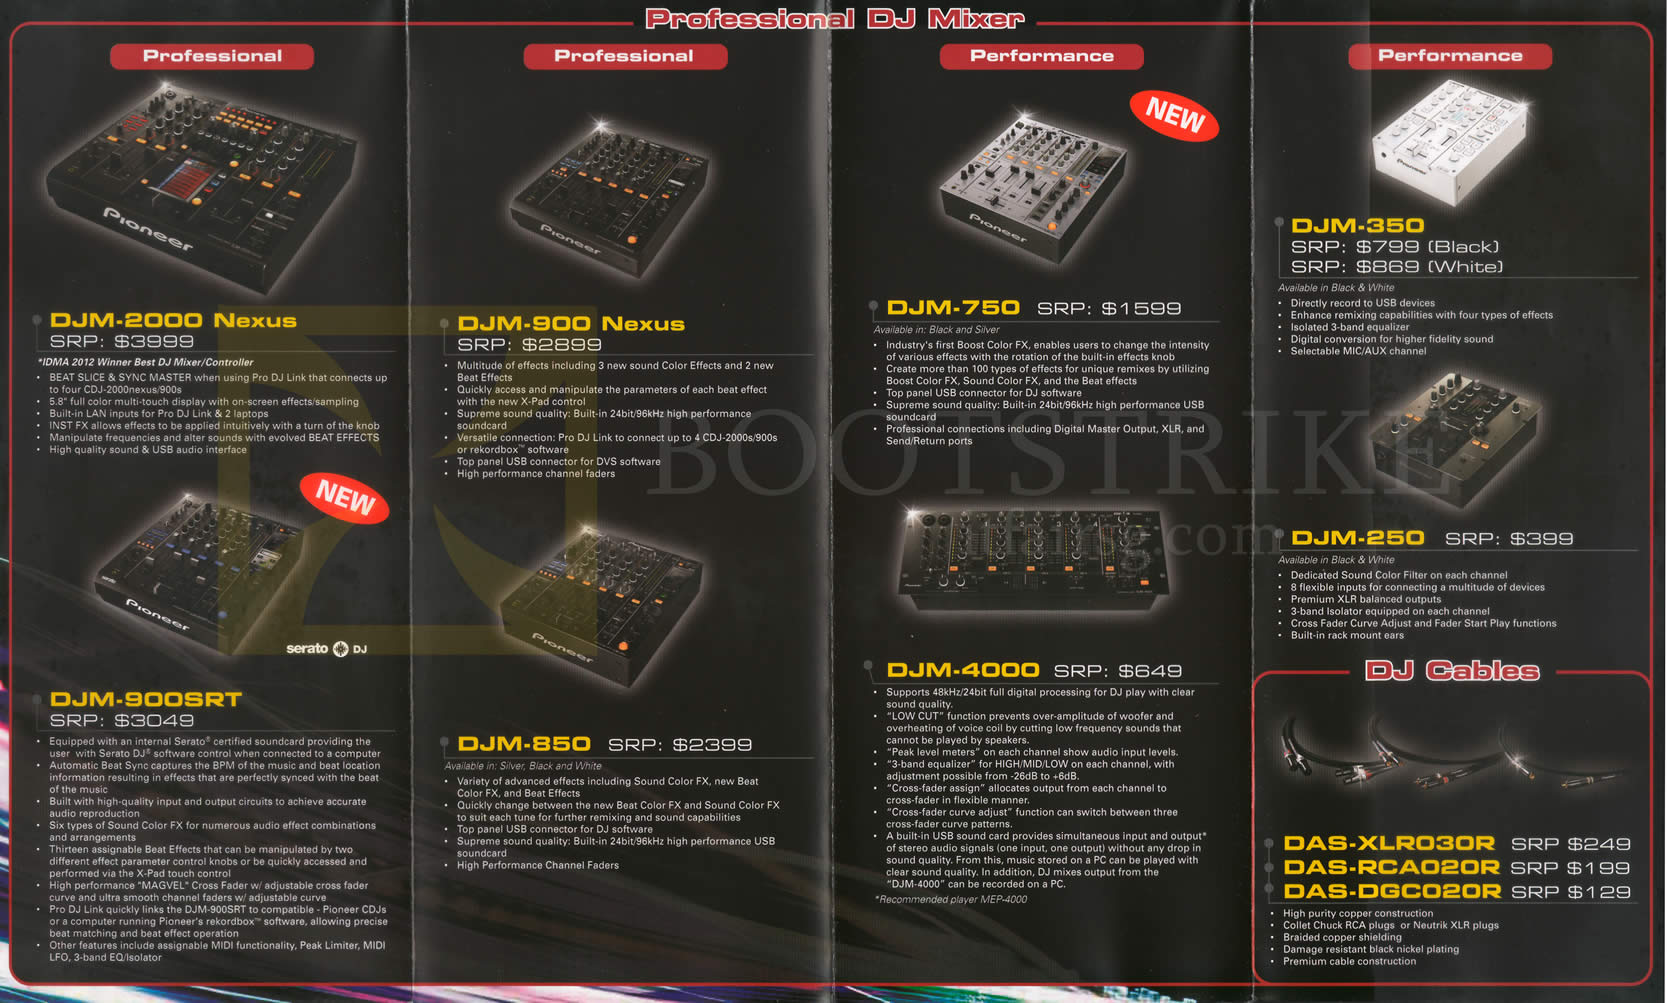 Pioneer Dj Mixers Djm 2000 900srt 900 850 750 4000 350 250 Cables Das Xlr030r